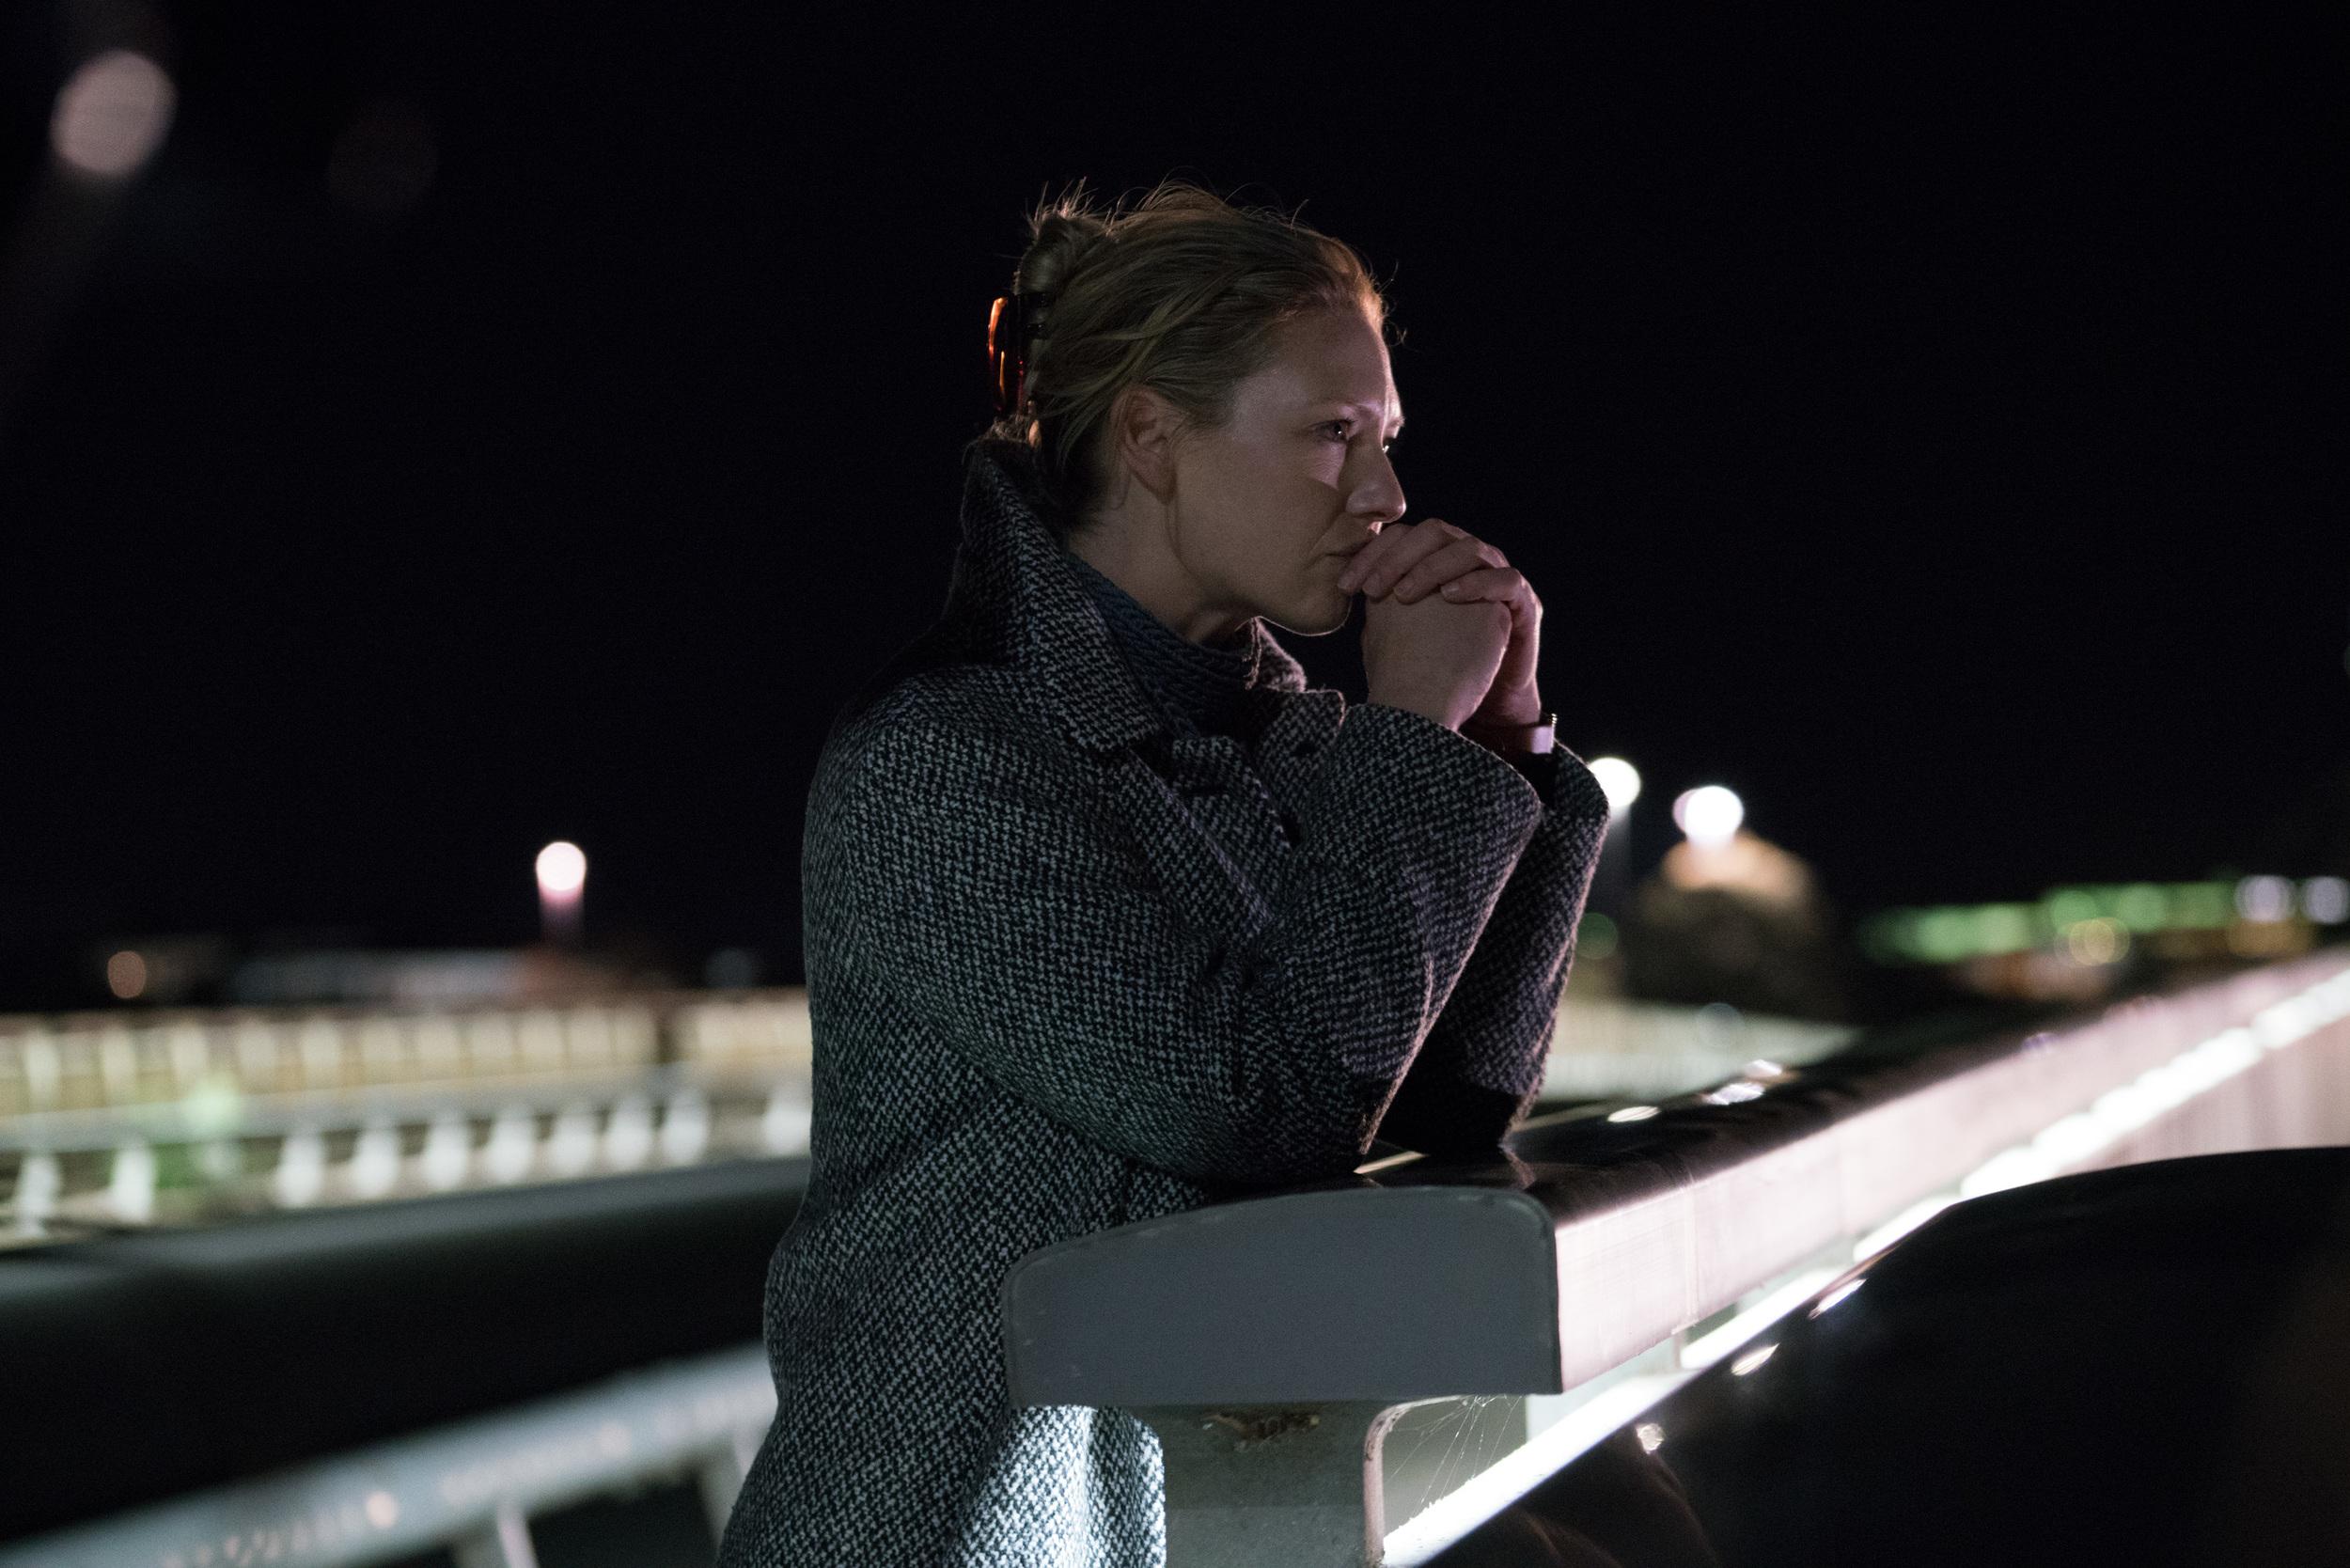 Secret-City-Harriet-Anna-Torv-contemplates-her-next-move-copy.jpg